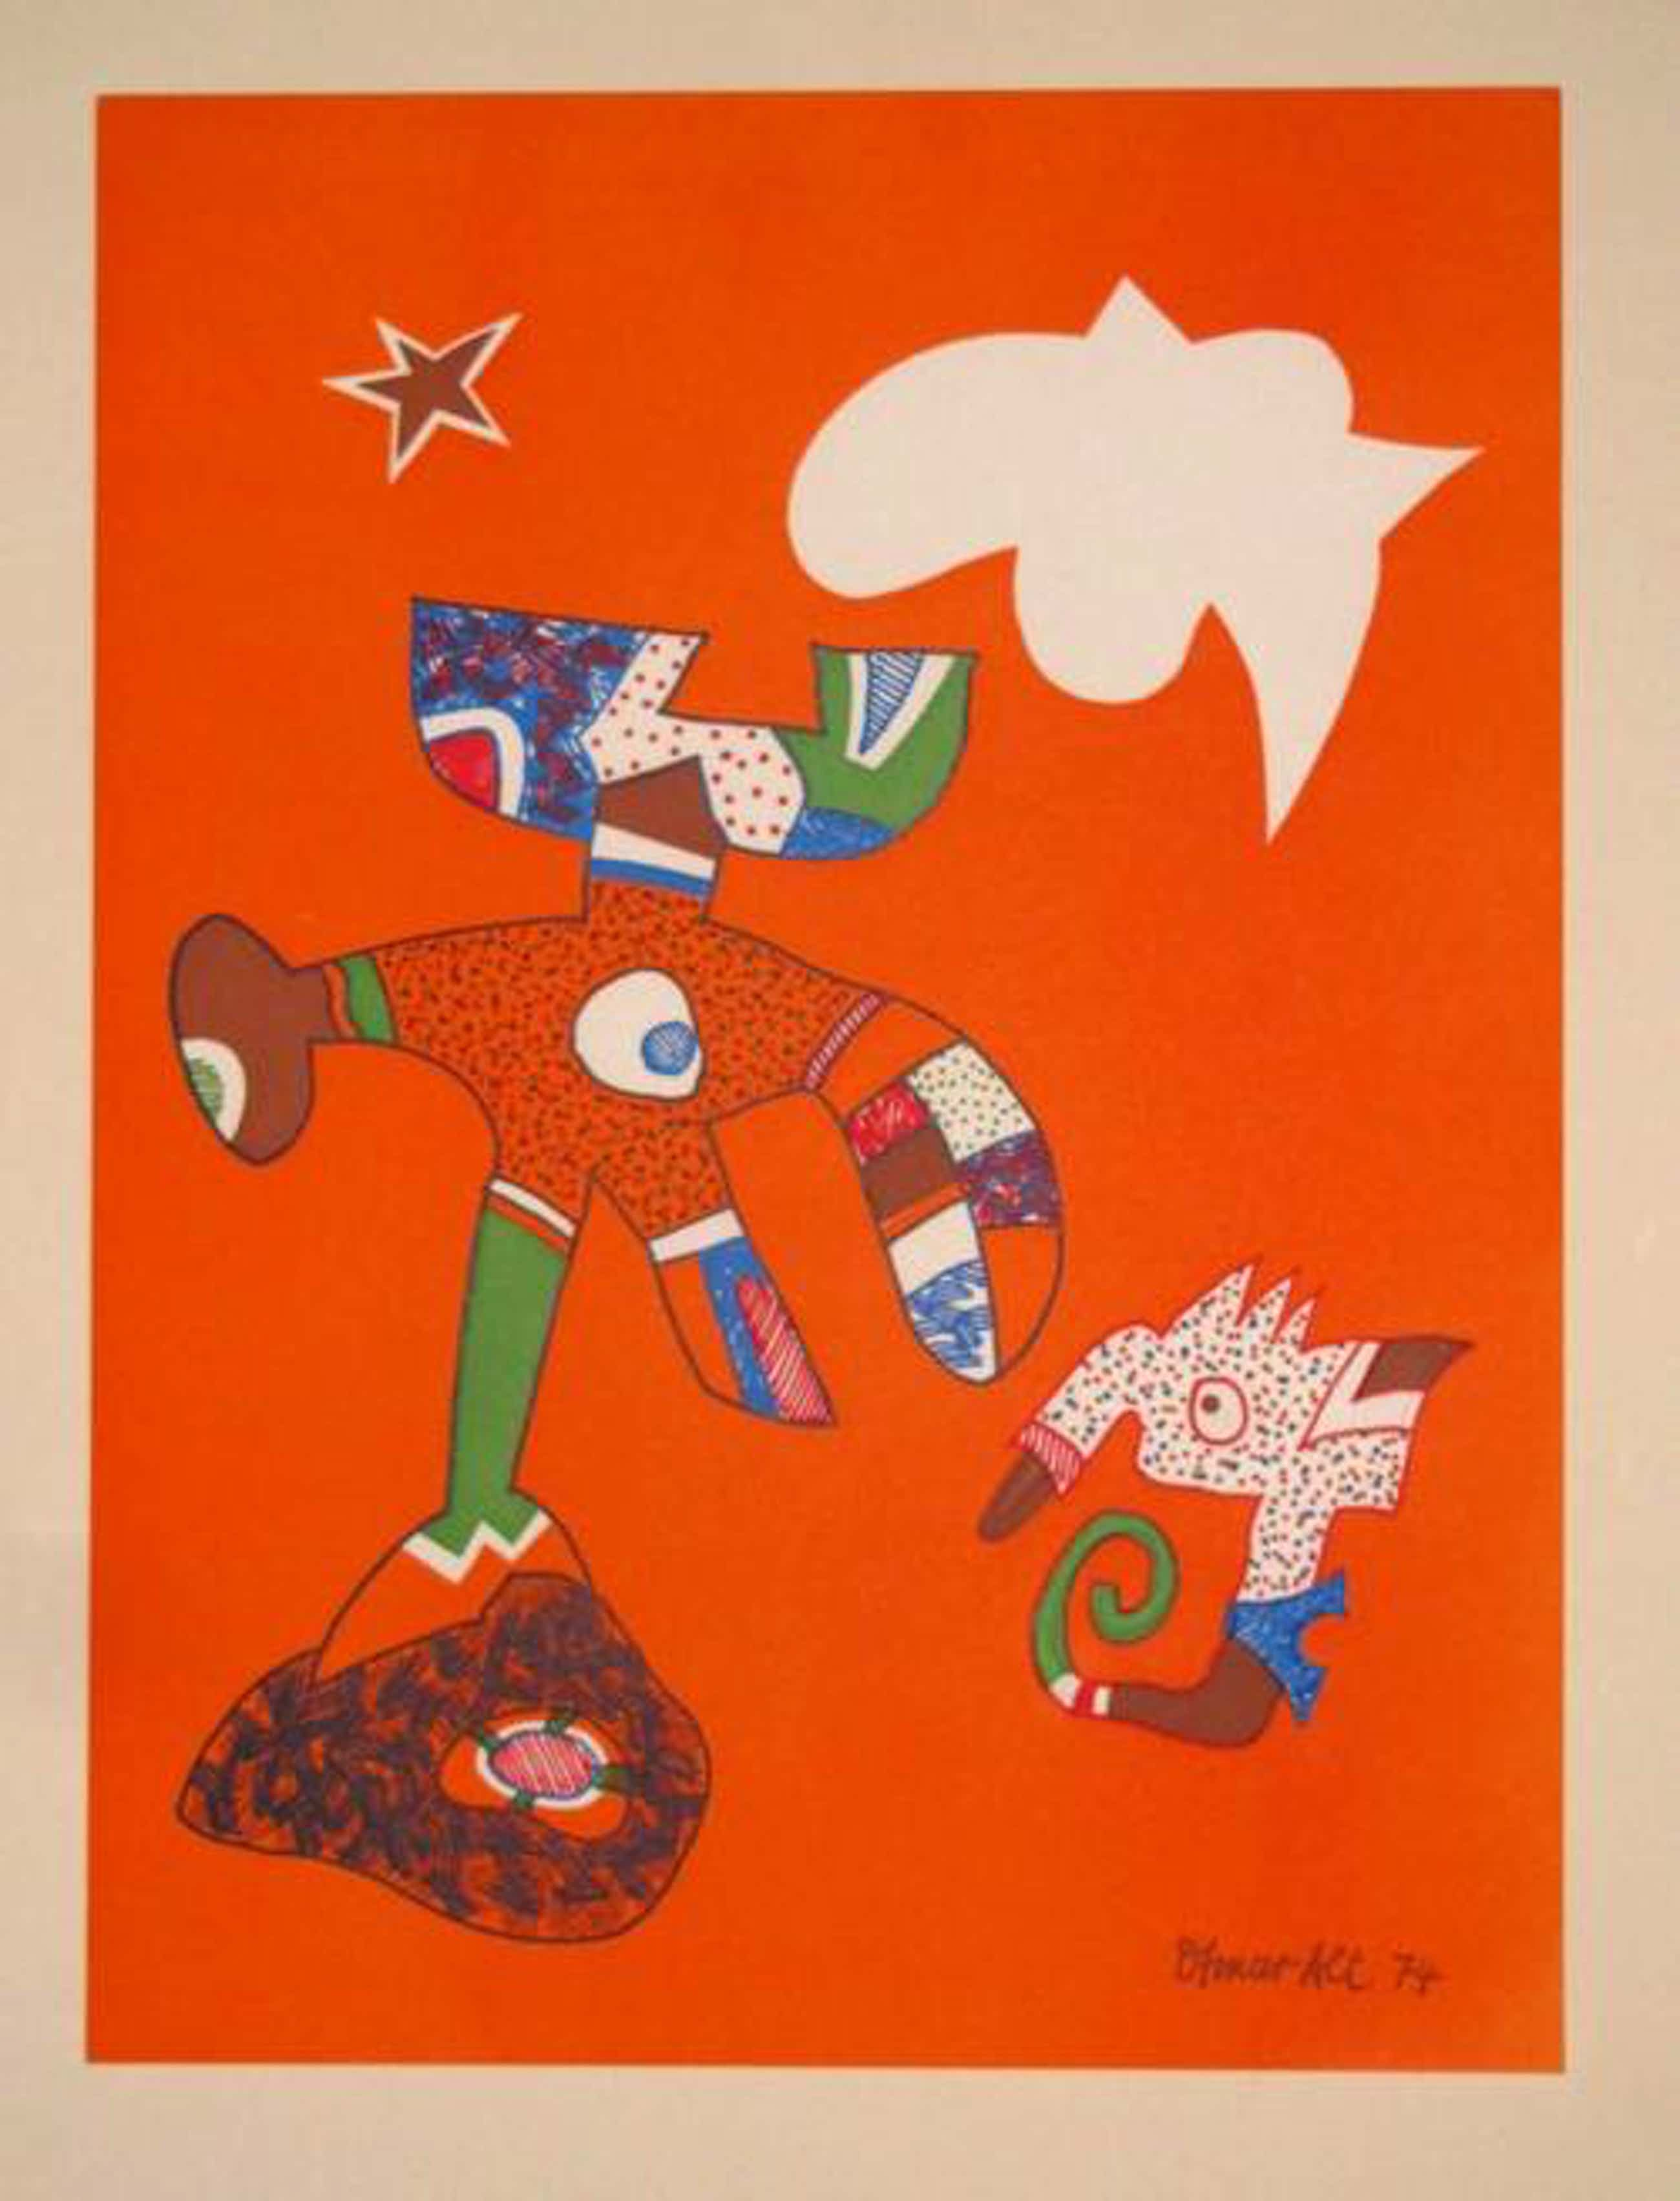 Otmar Alt - Ohne Titel, 1974, Farbserigraphie, signiert kopen? Bied vanaf 85!